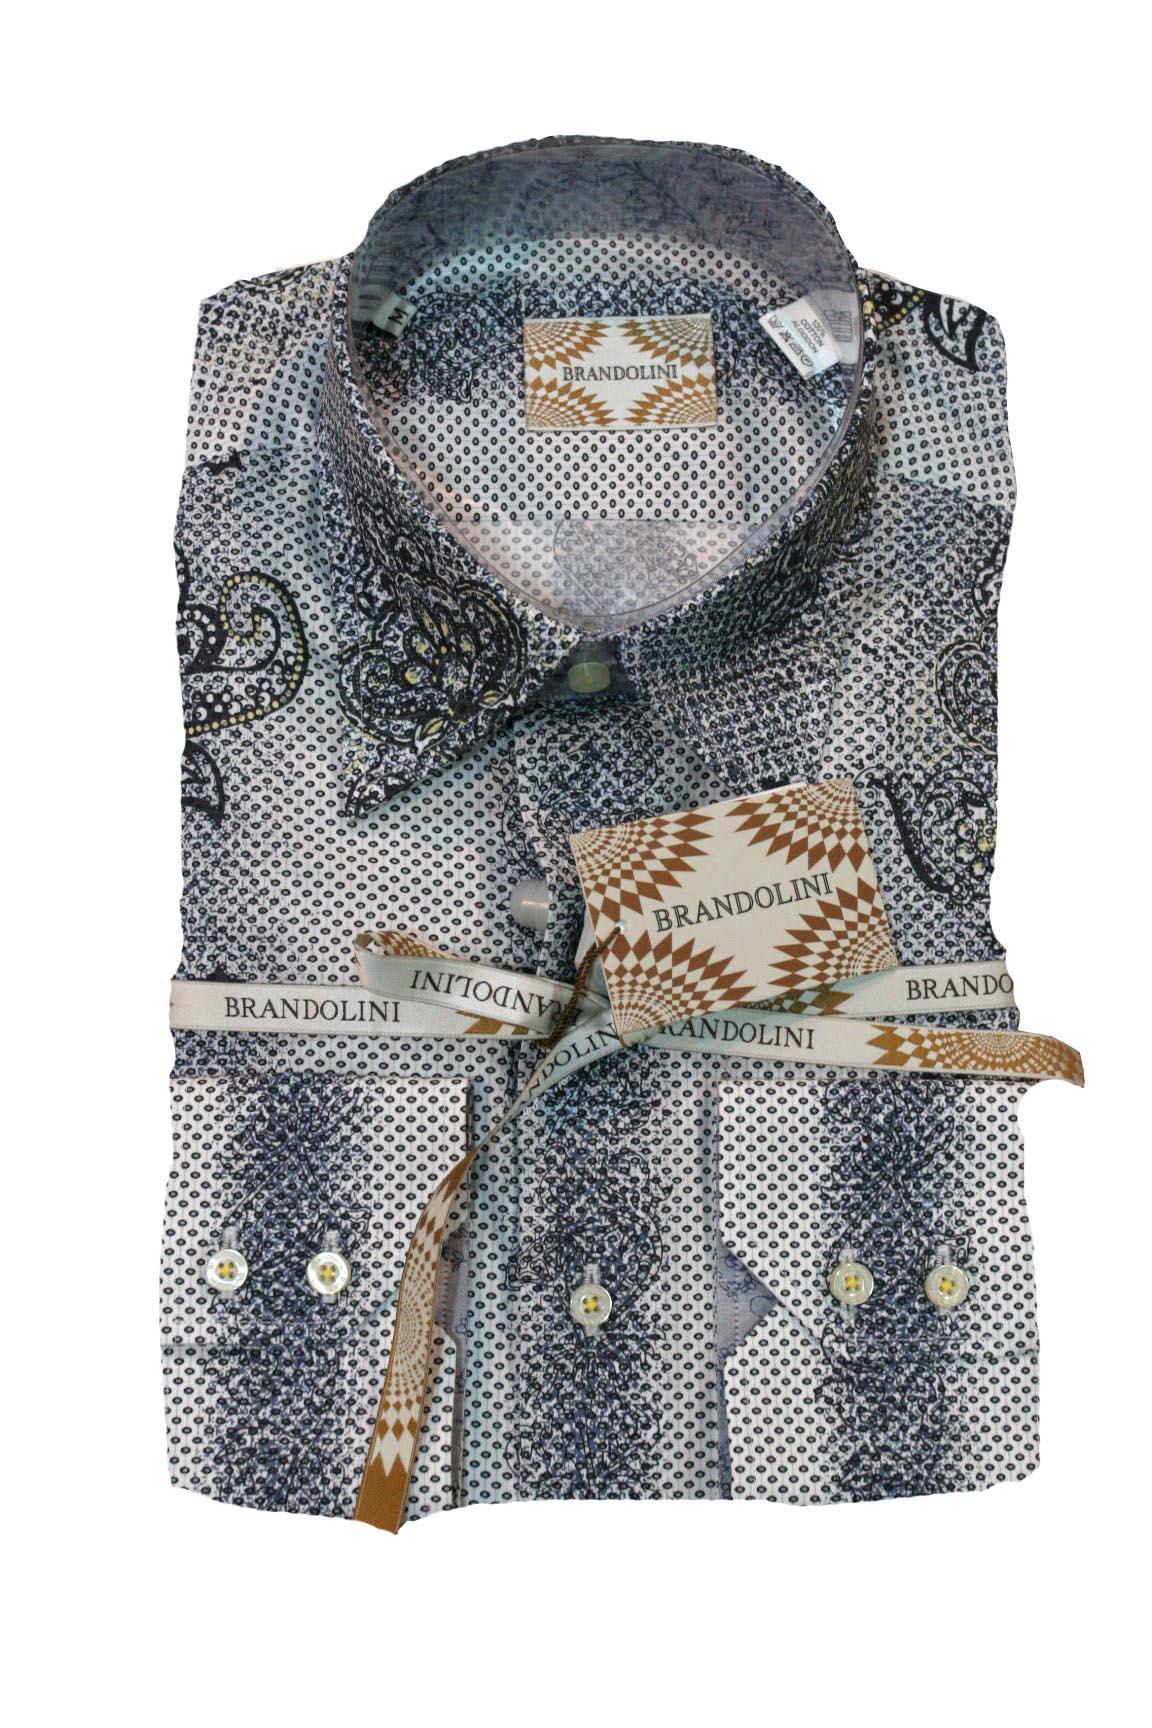 Brandolini Patterned Shirt | Ruggi's Fine Italian Clothing